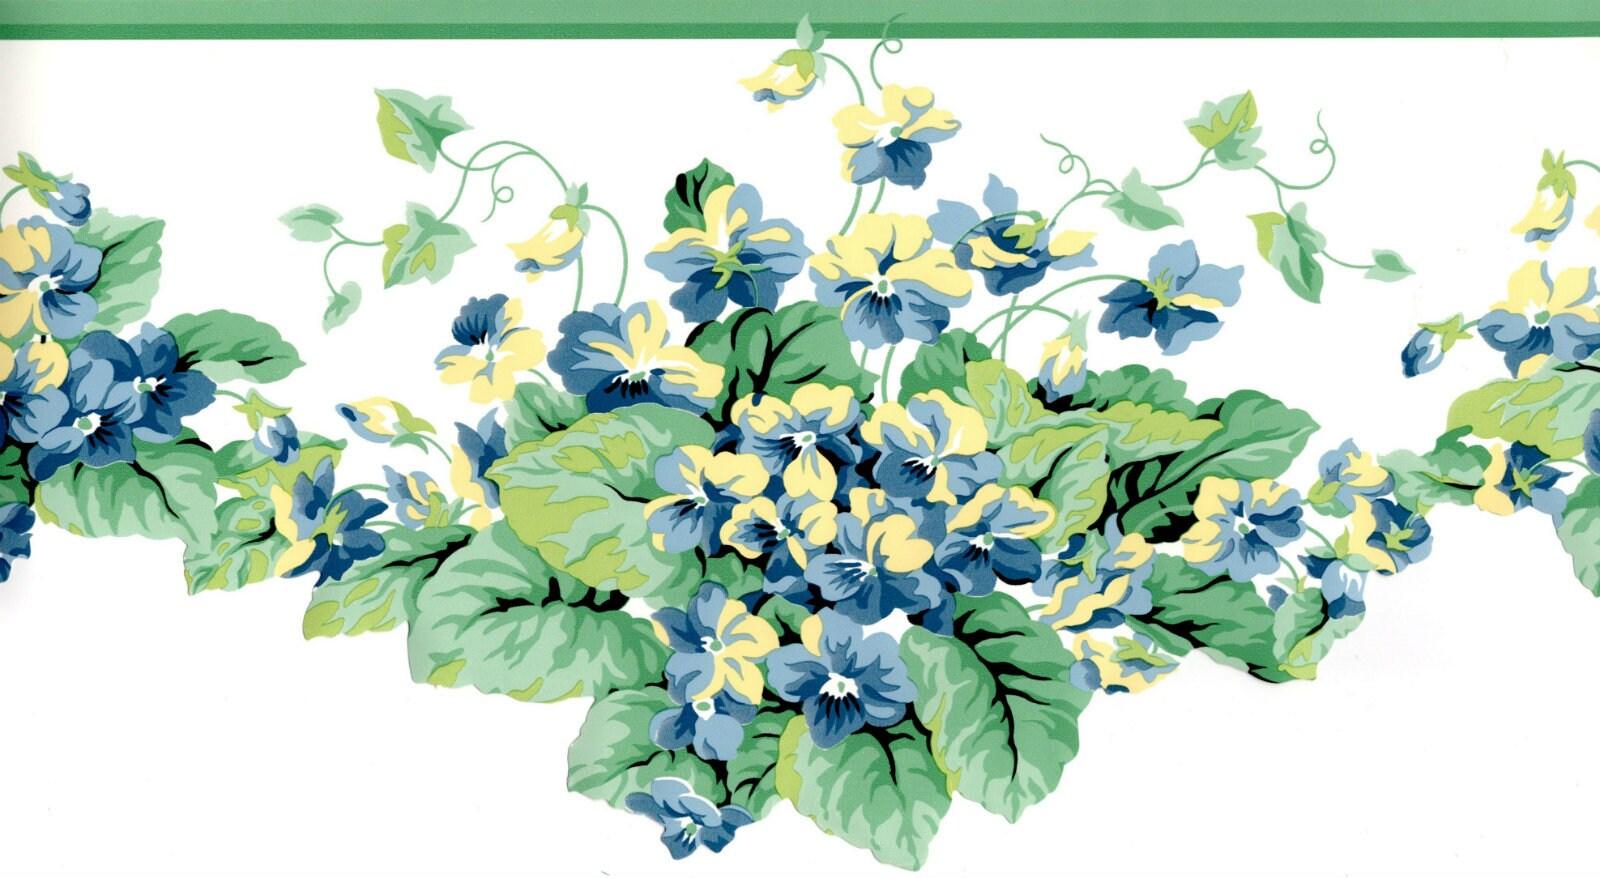 Floral Leave Trail Wallpaper Border Tropical Leaf Wallpaper Etsy